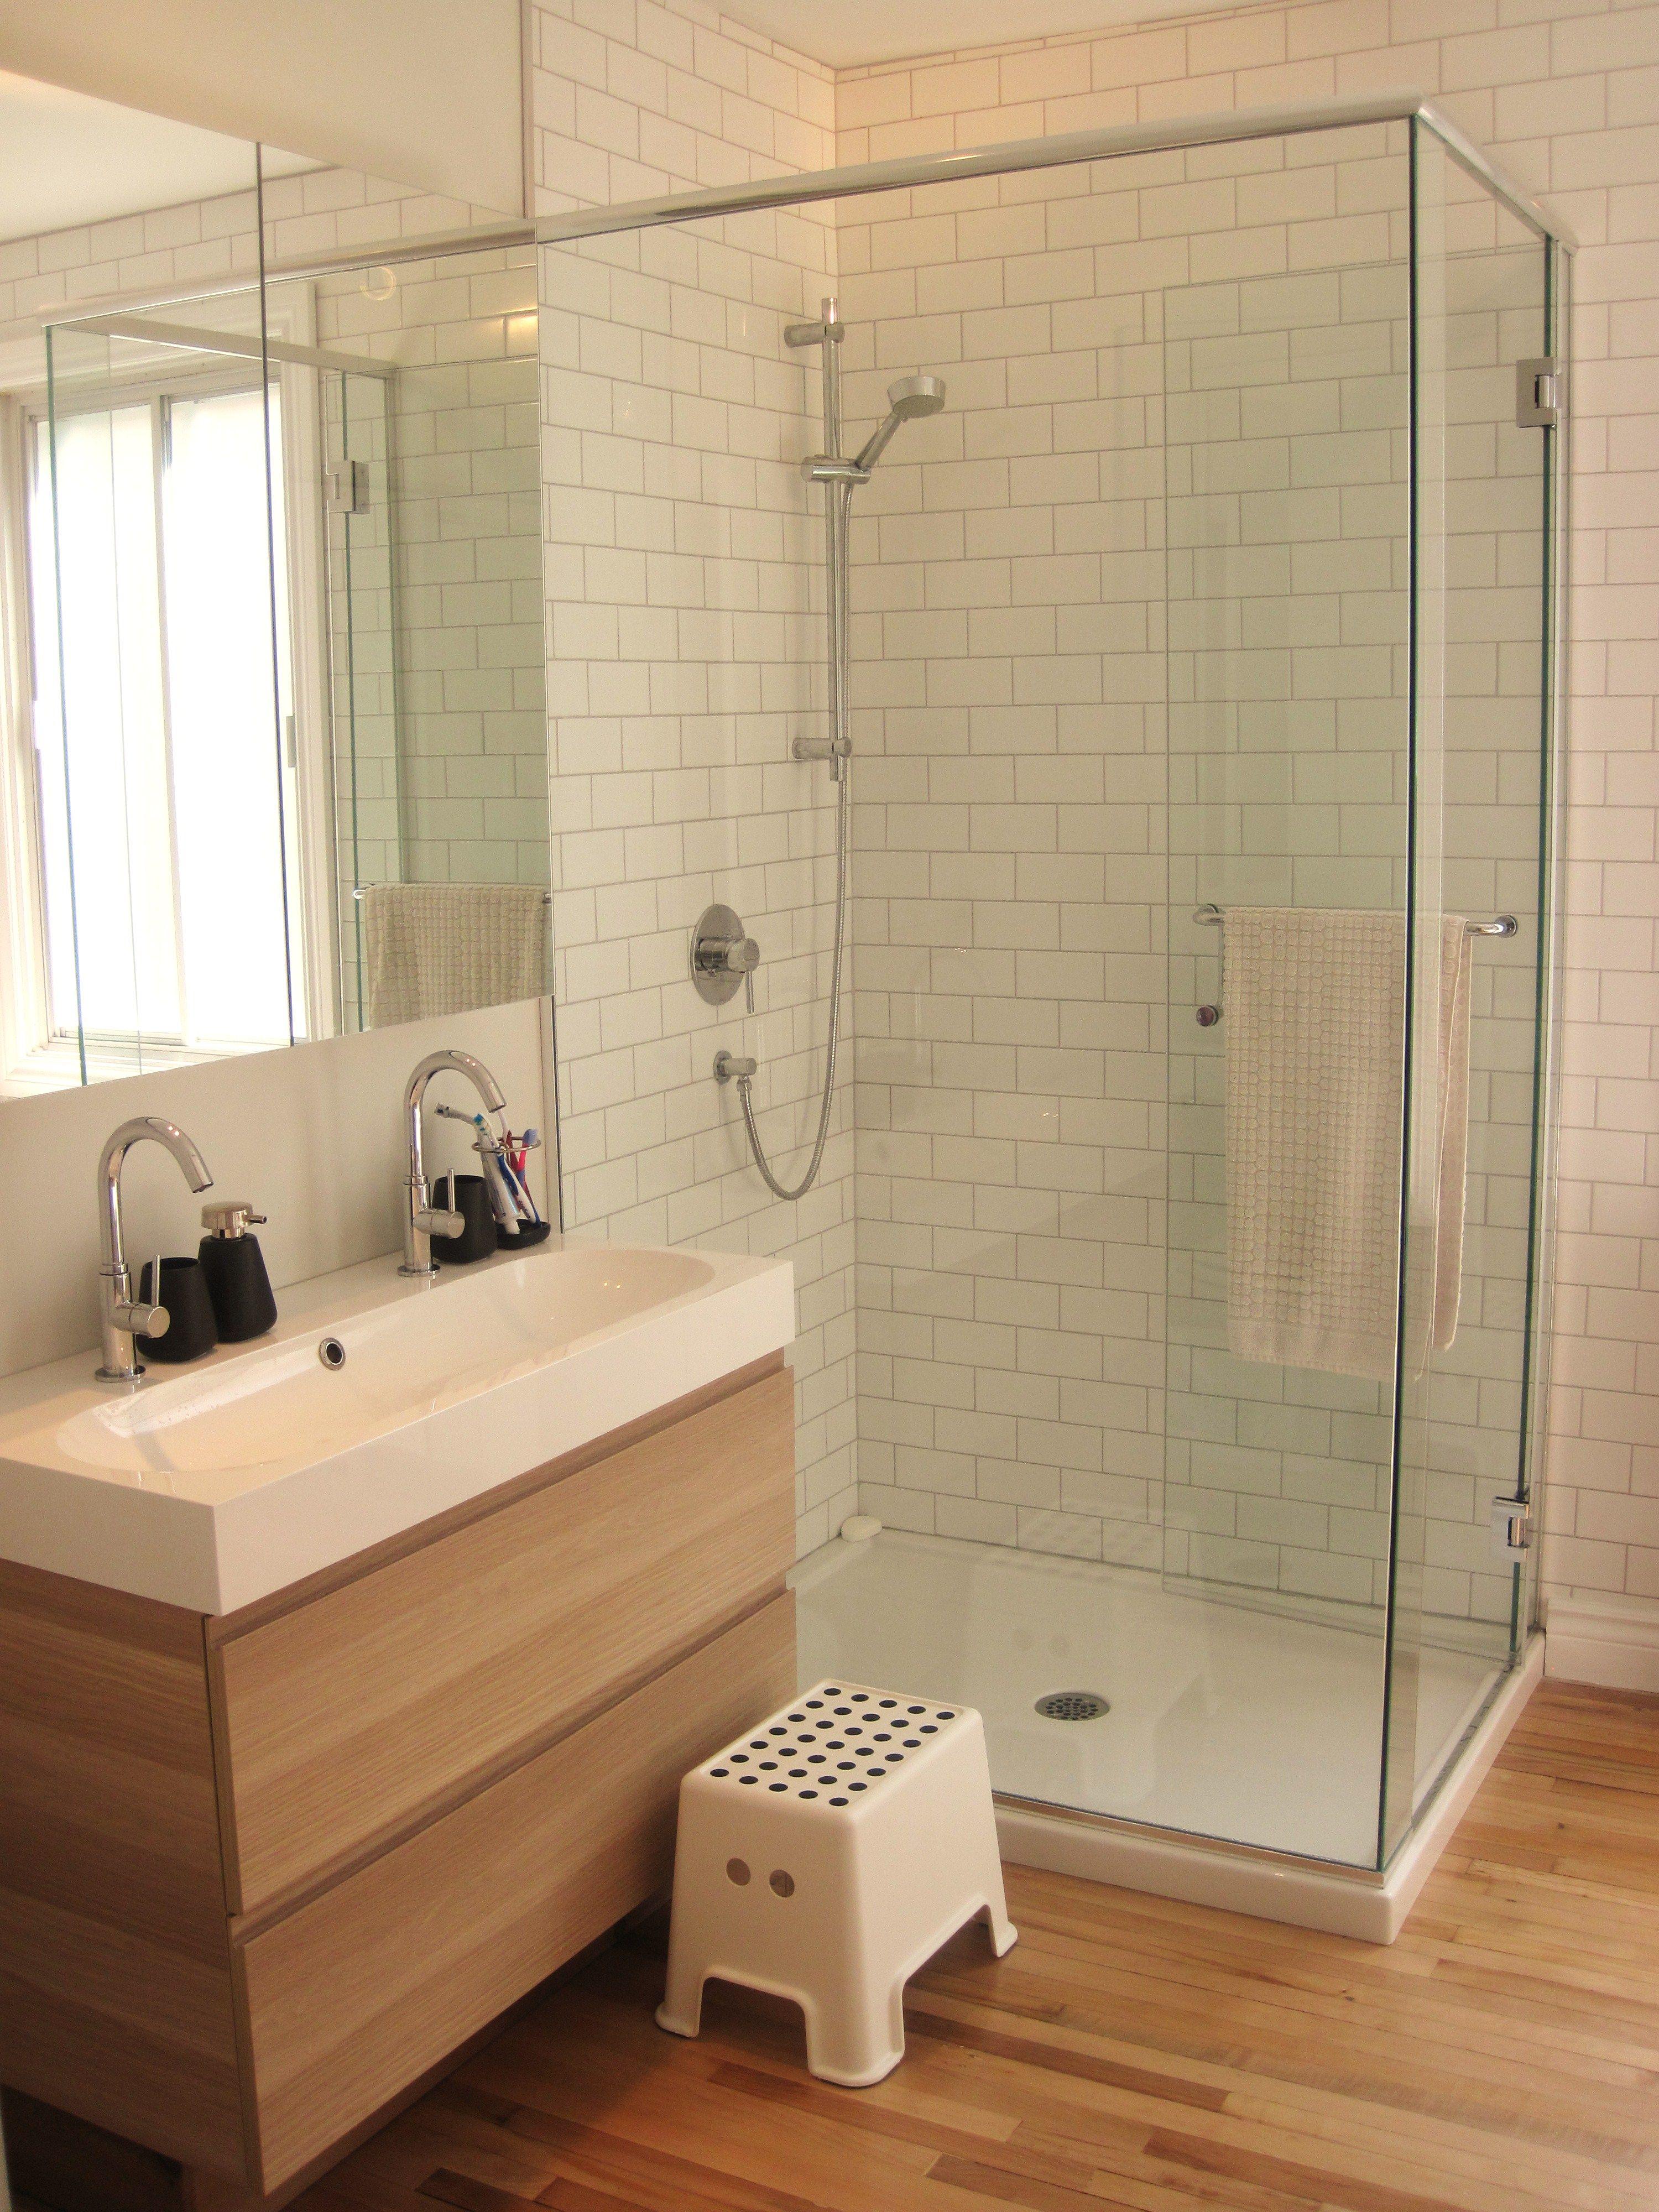 Ikea echelle salle de bain maison design for Echelle salle de bain ikea